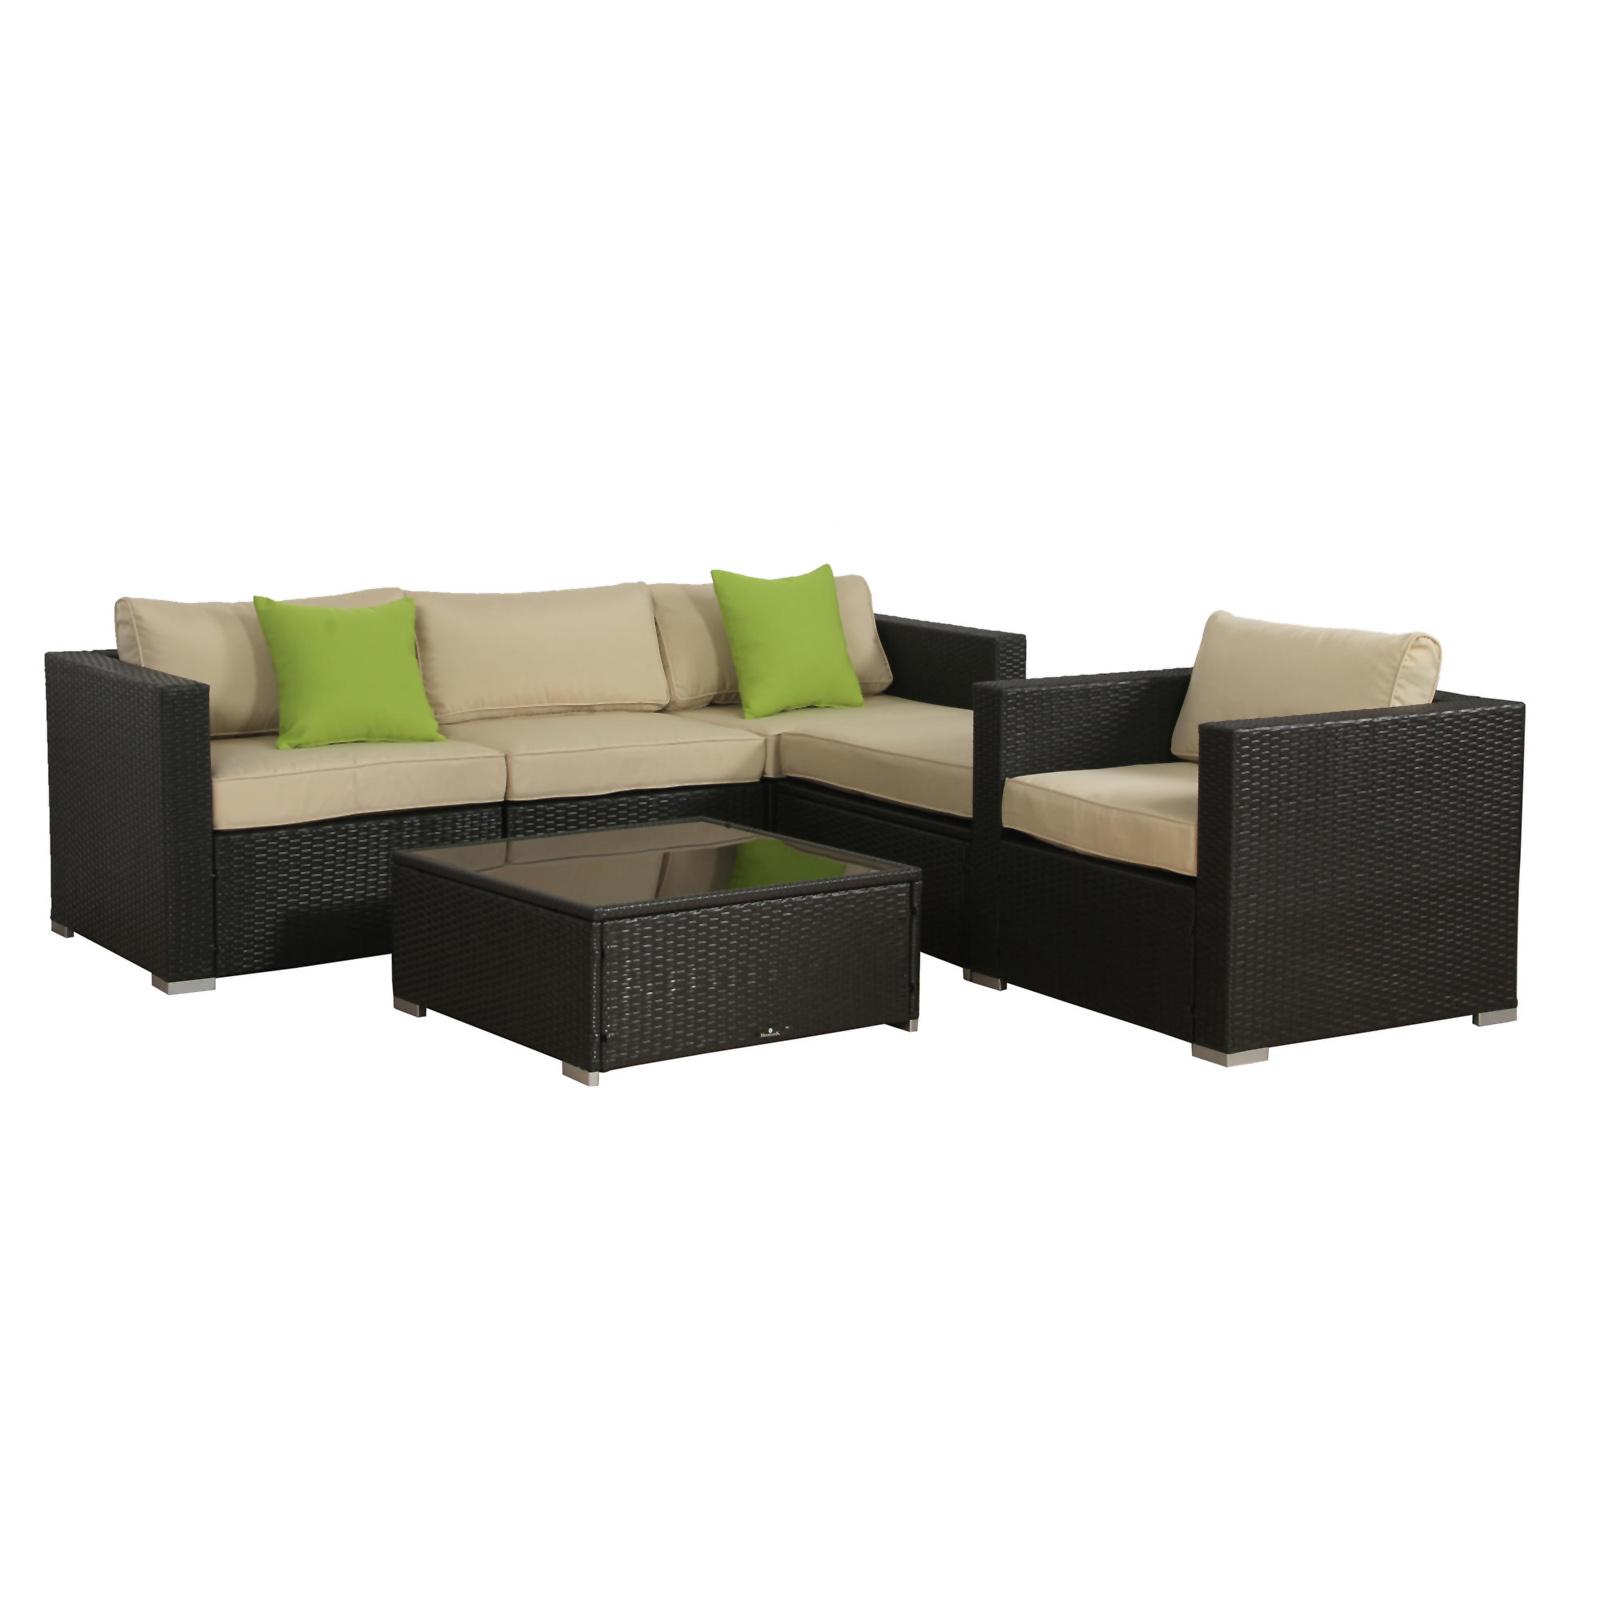 Broyerk 6pc. Outdoor Rattan Wicker Furniture Set - Sears